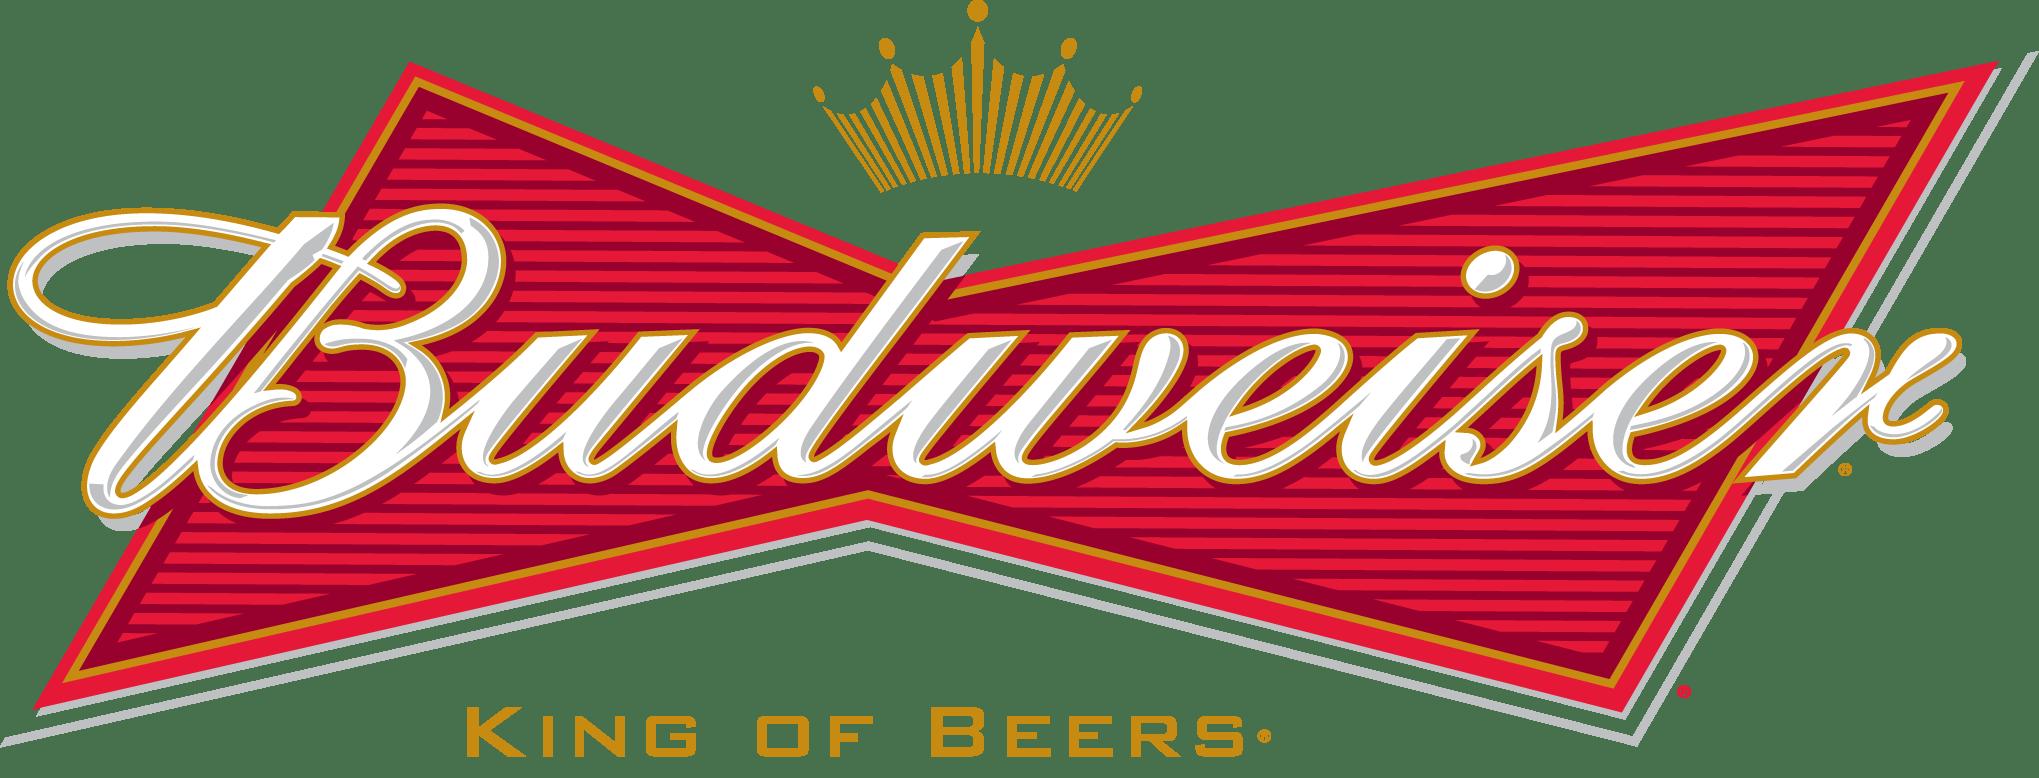 budweiser color logo rh bradentonarearegatta com budweiser logo vector budweiser logo vector